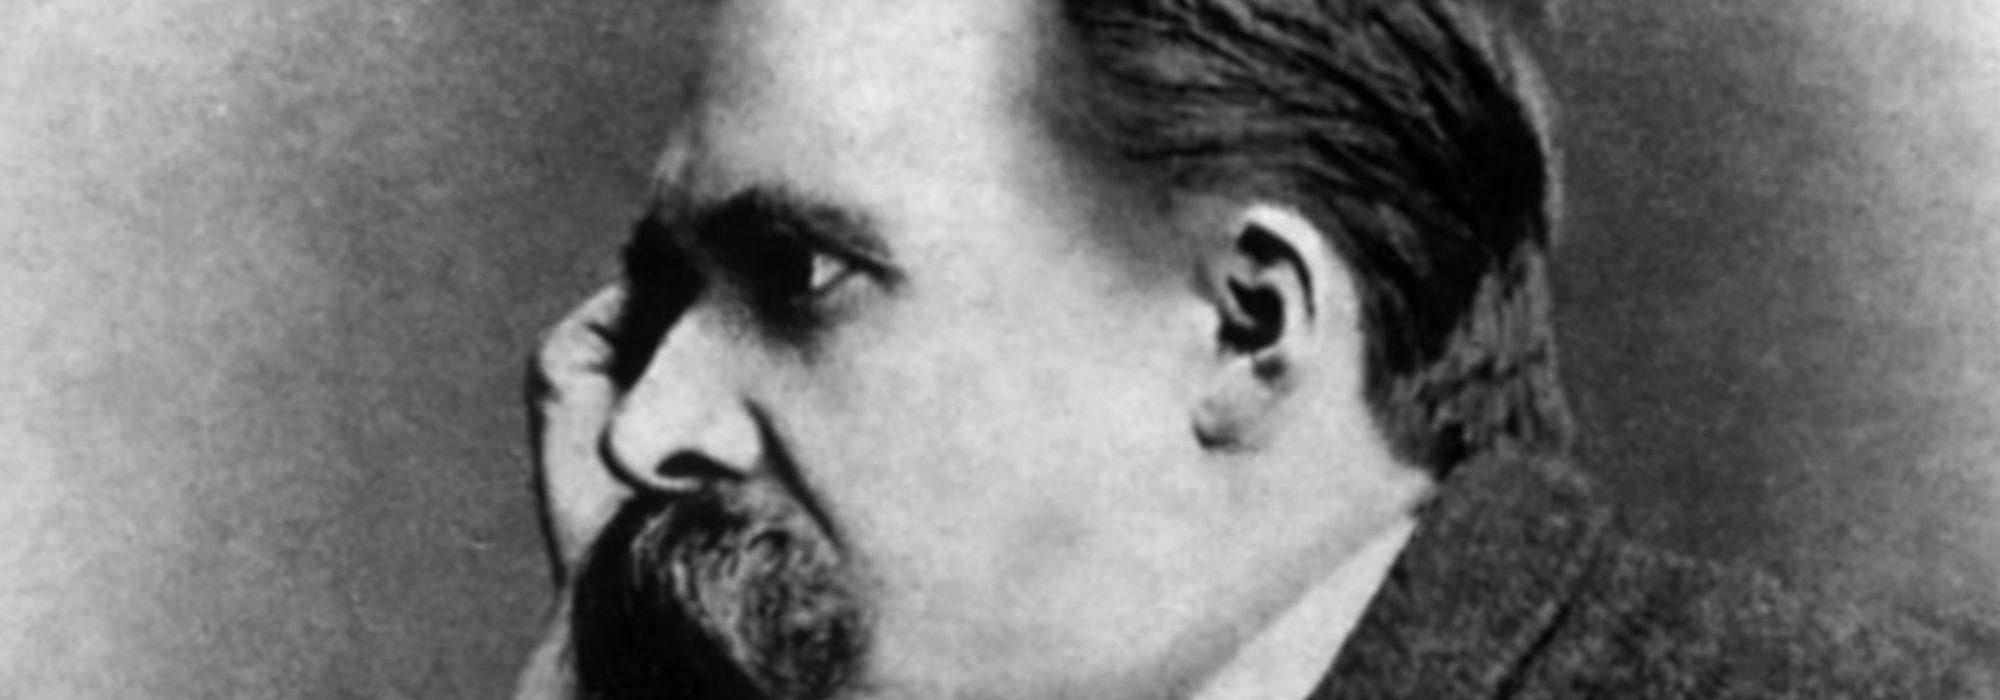 Foto: retrato de Nietzsche por Gustav Adolf Schultze (1882)